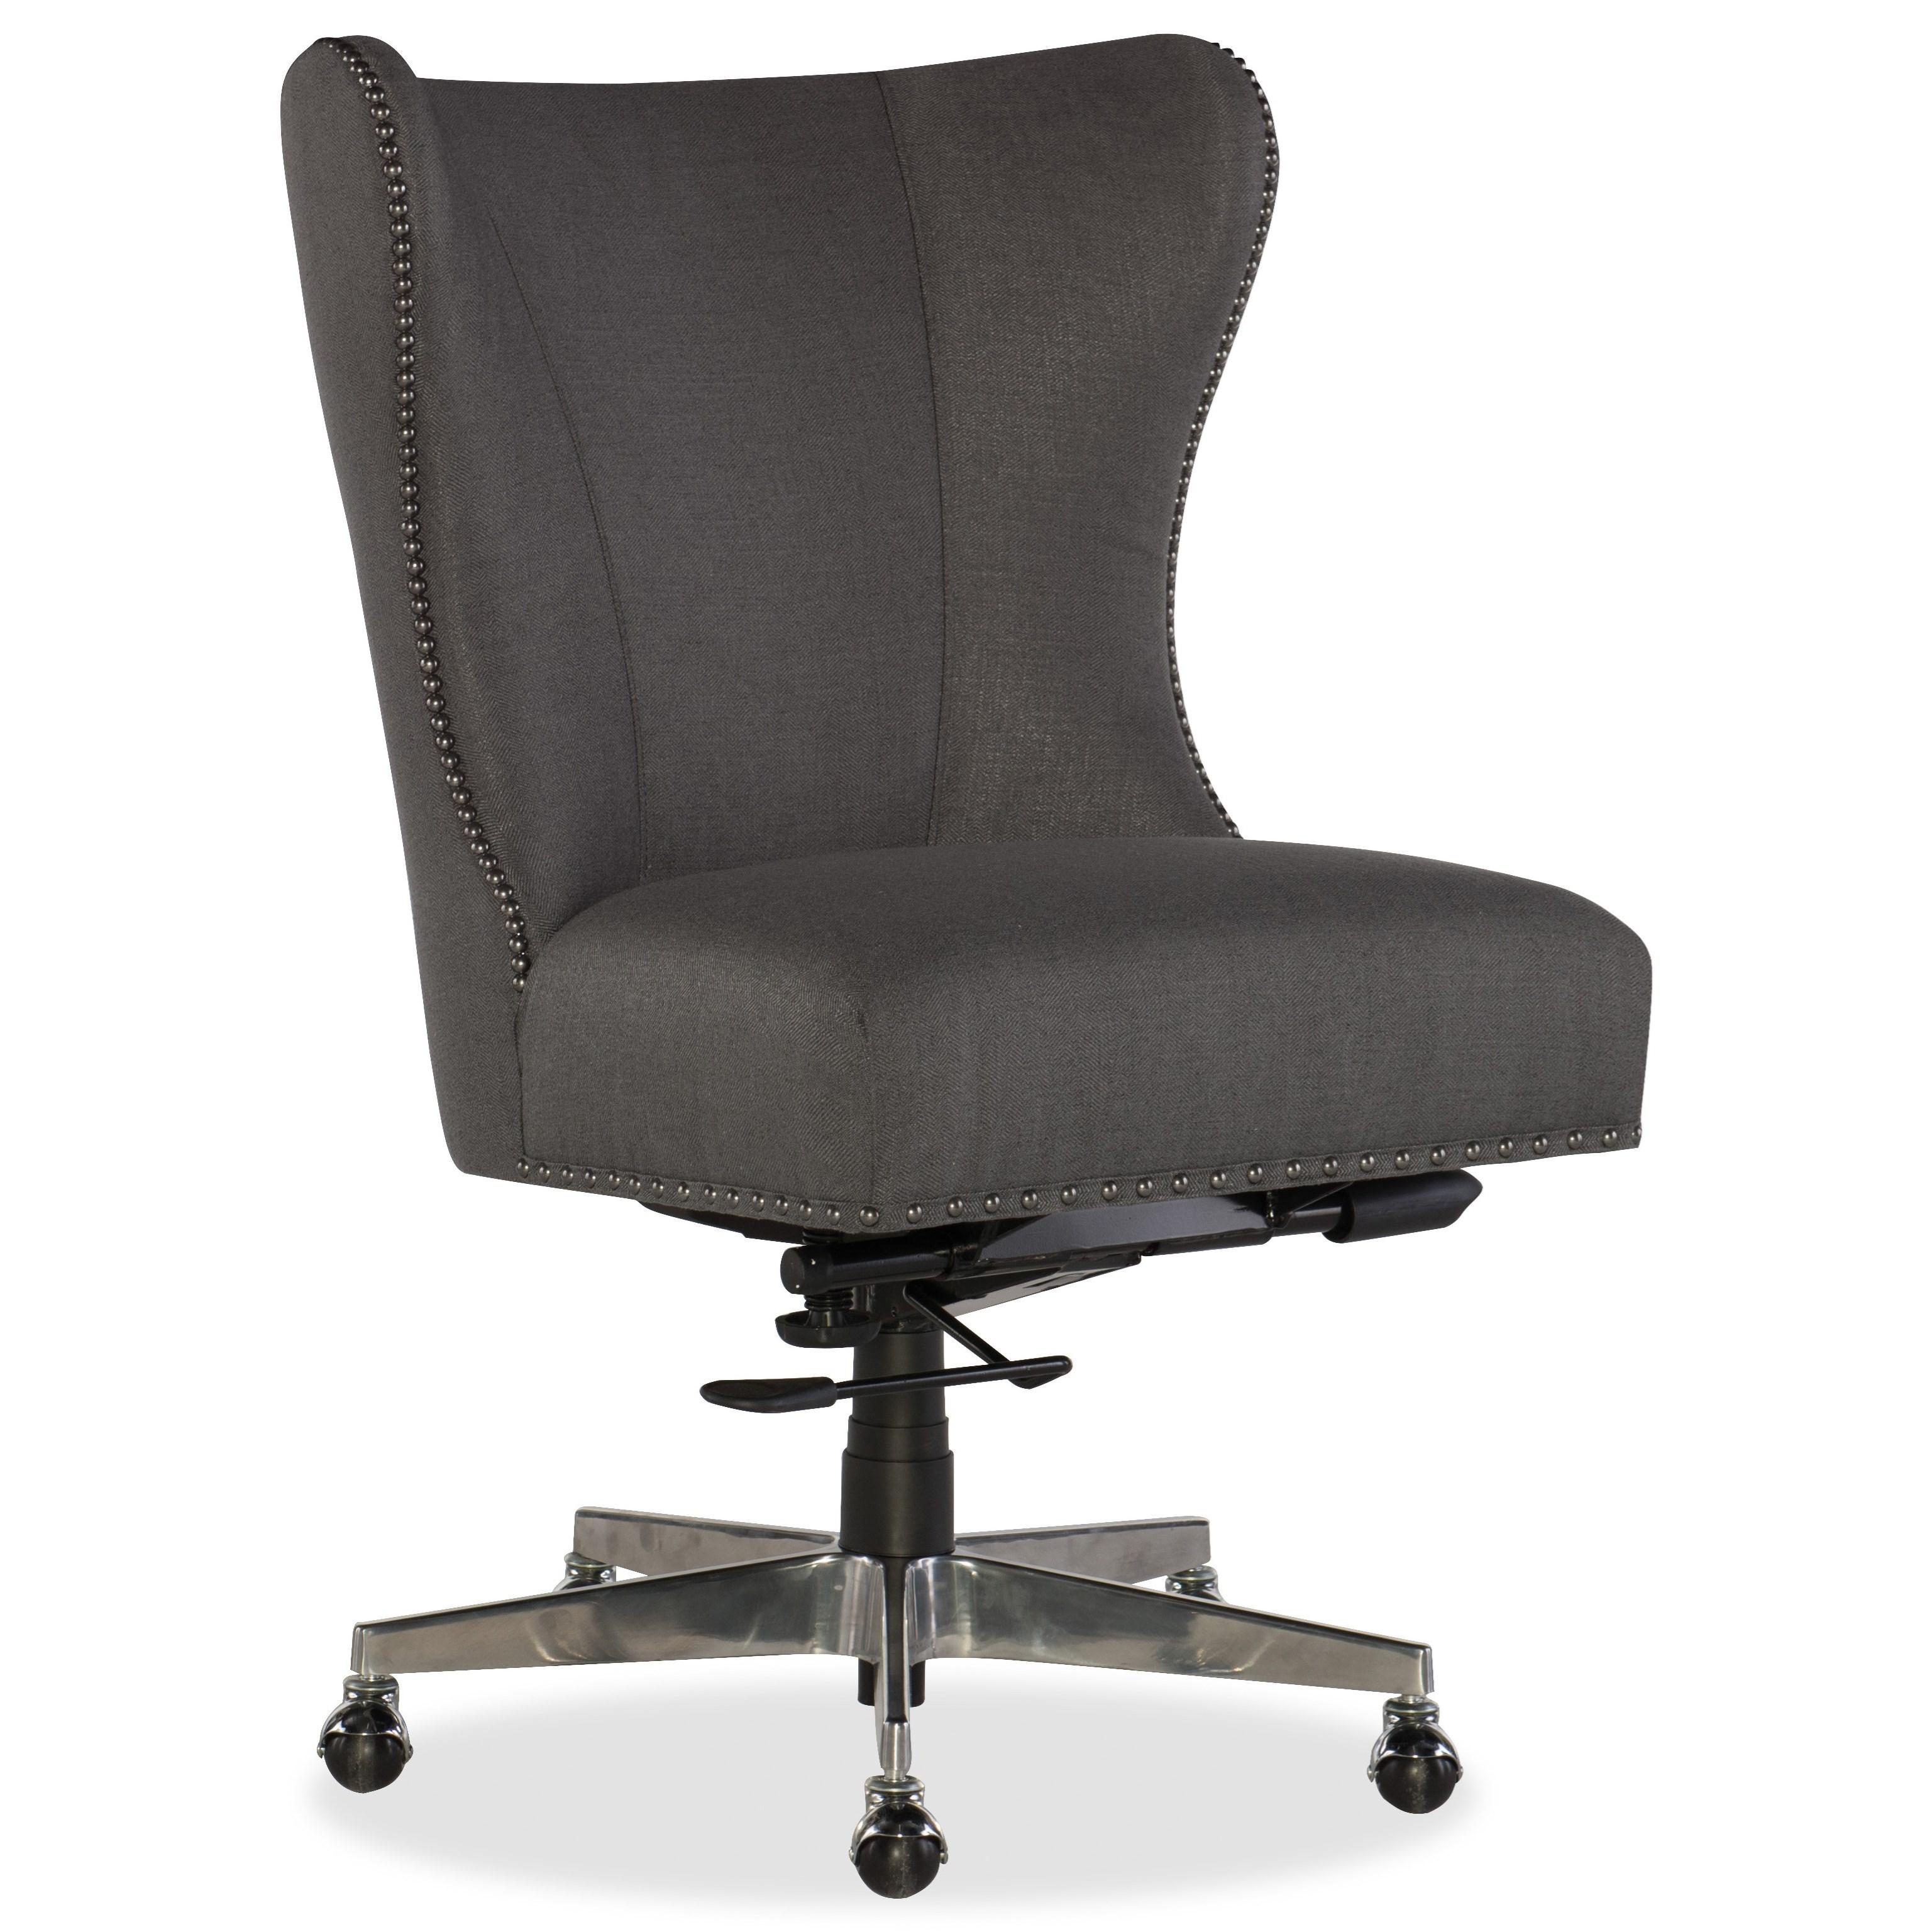 Hooker Furniture Juliet Transitional Home Office Swivel Chair